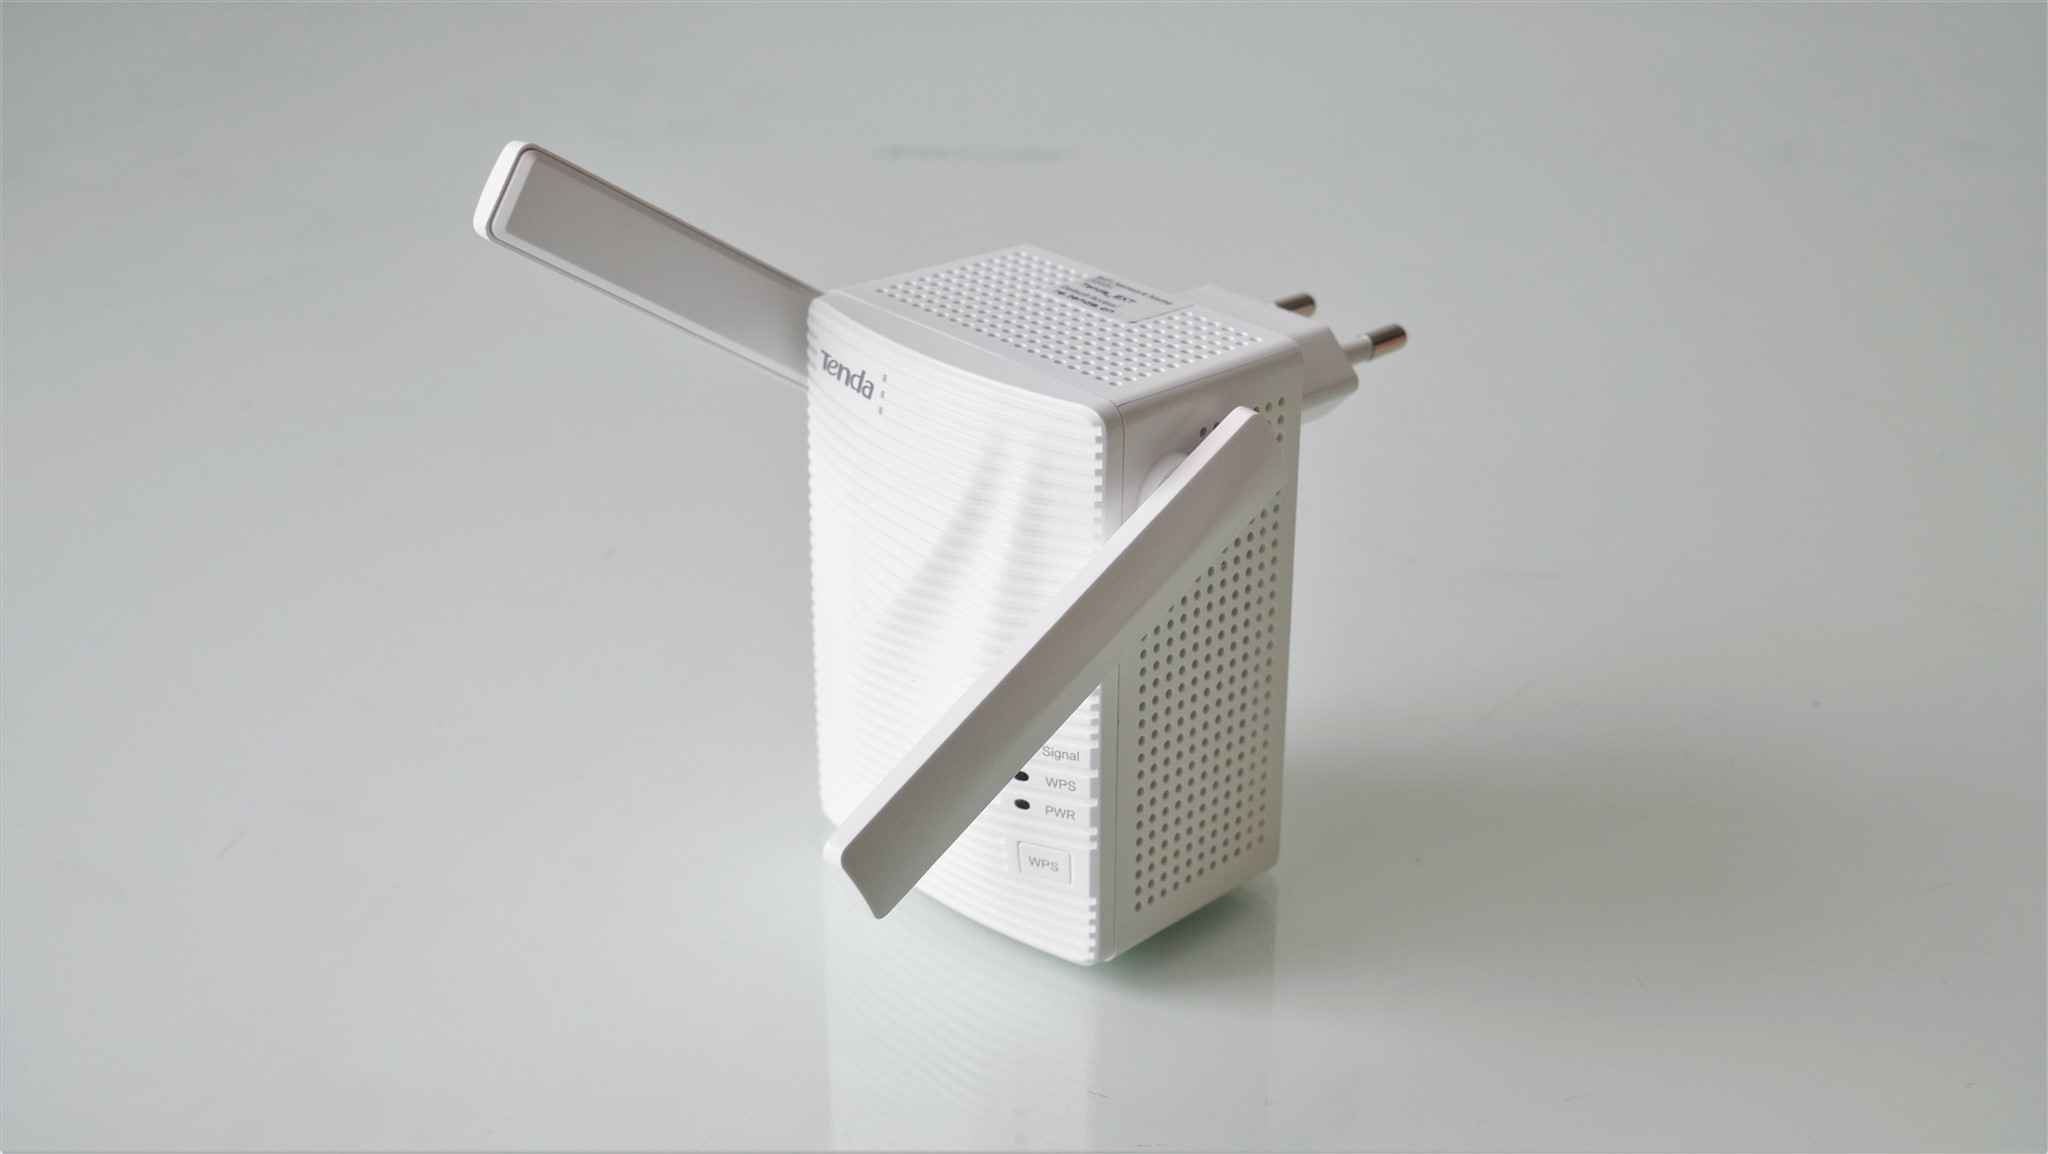 Wi-Fi repeater dual-band AC1200 Tenda A18